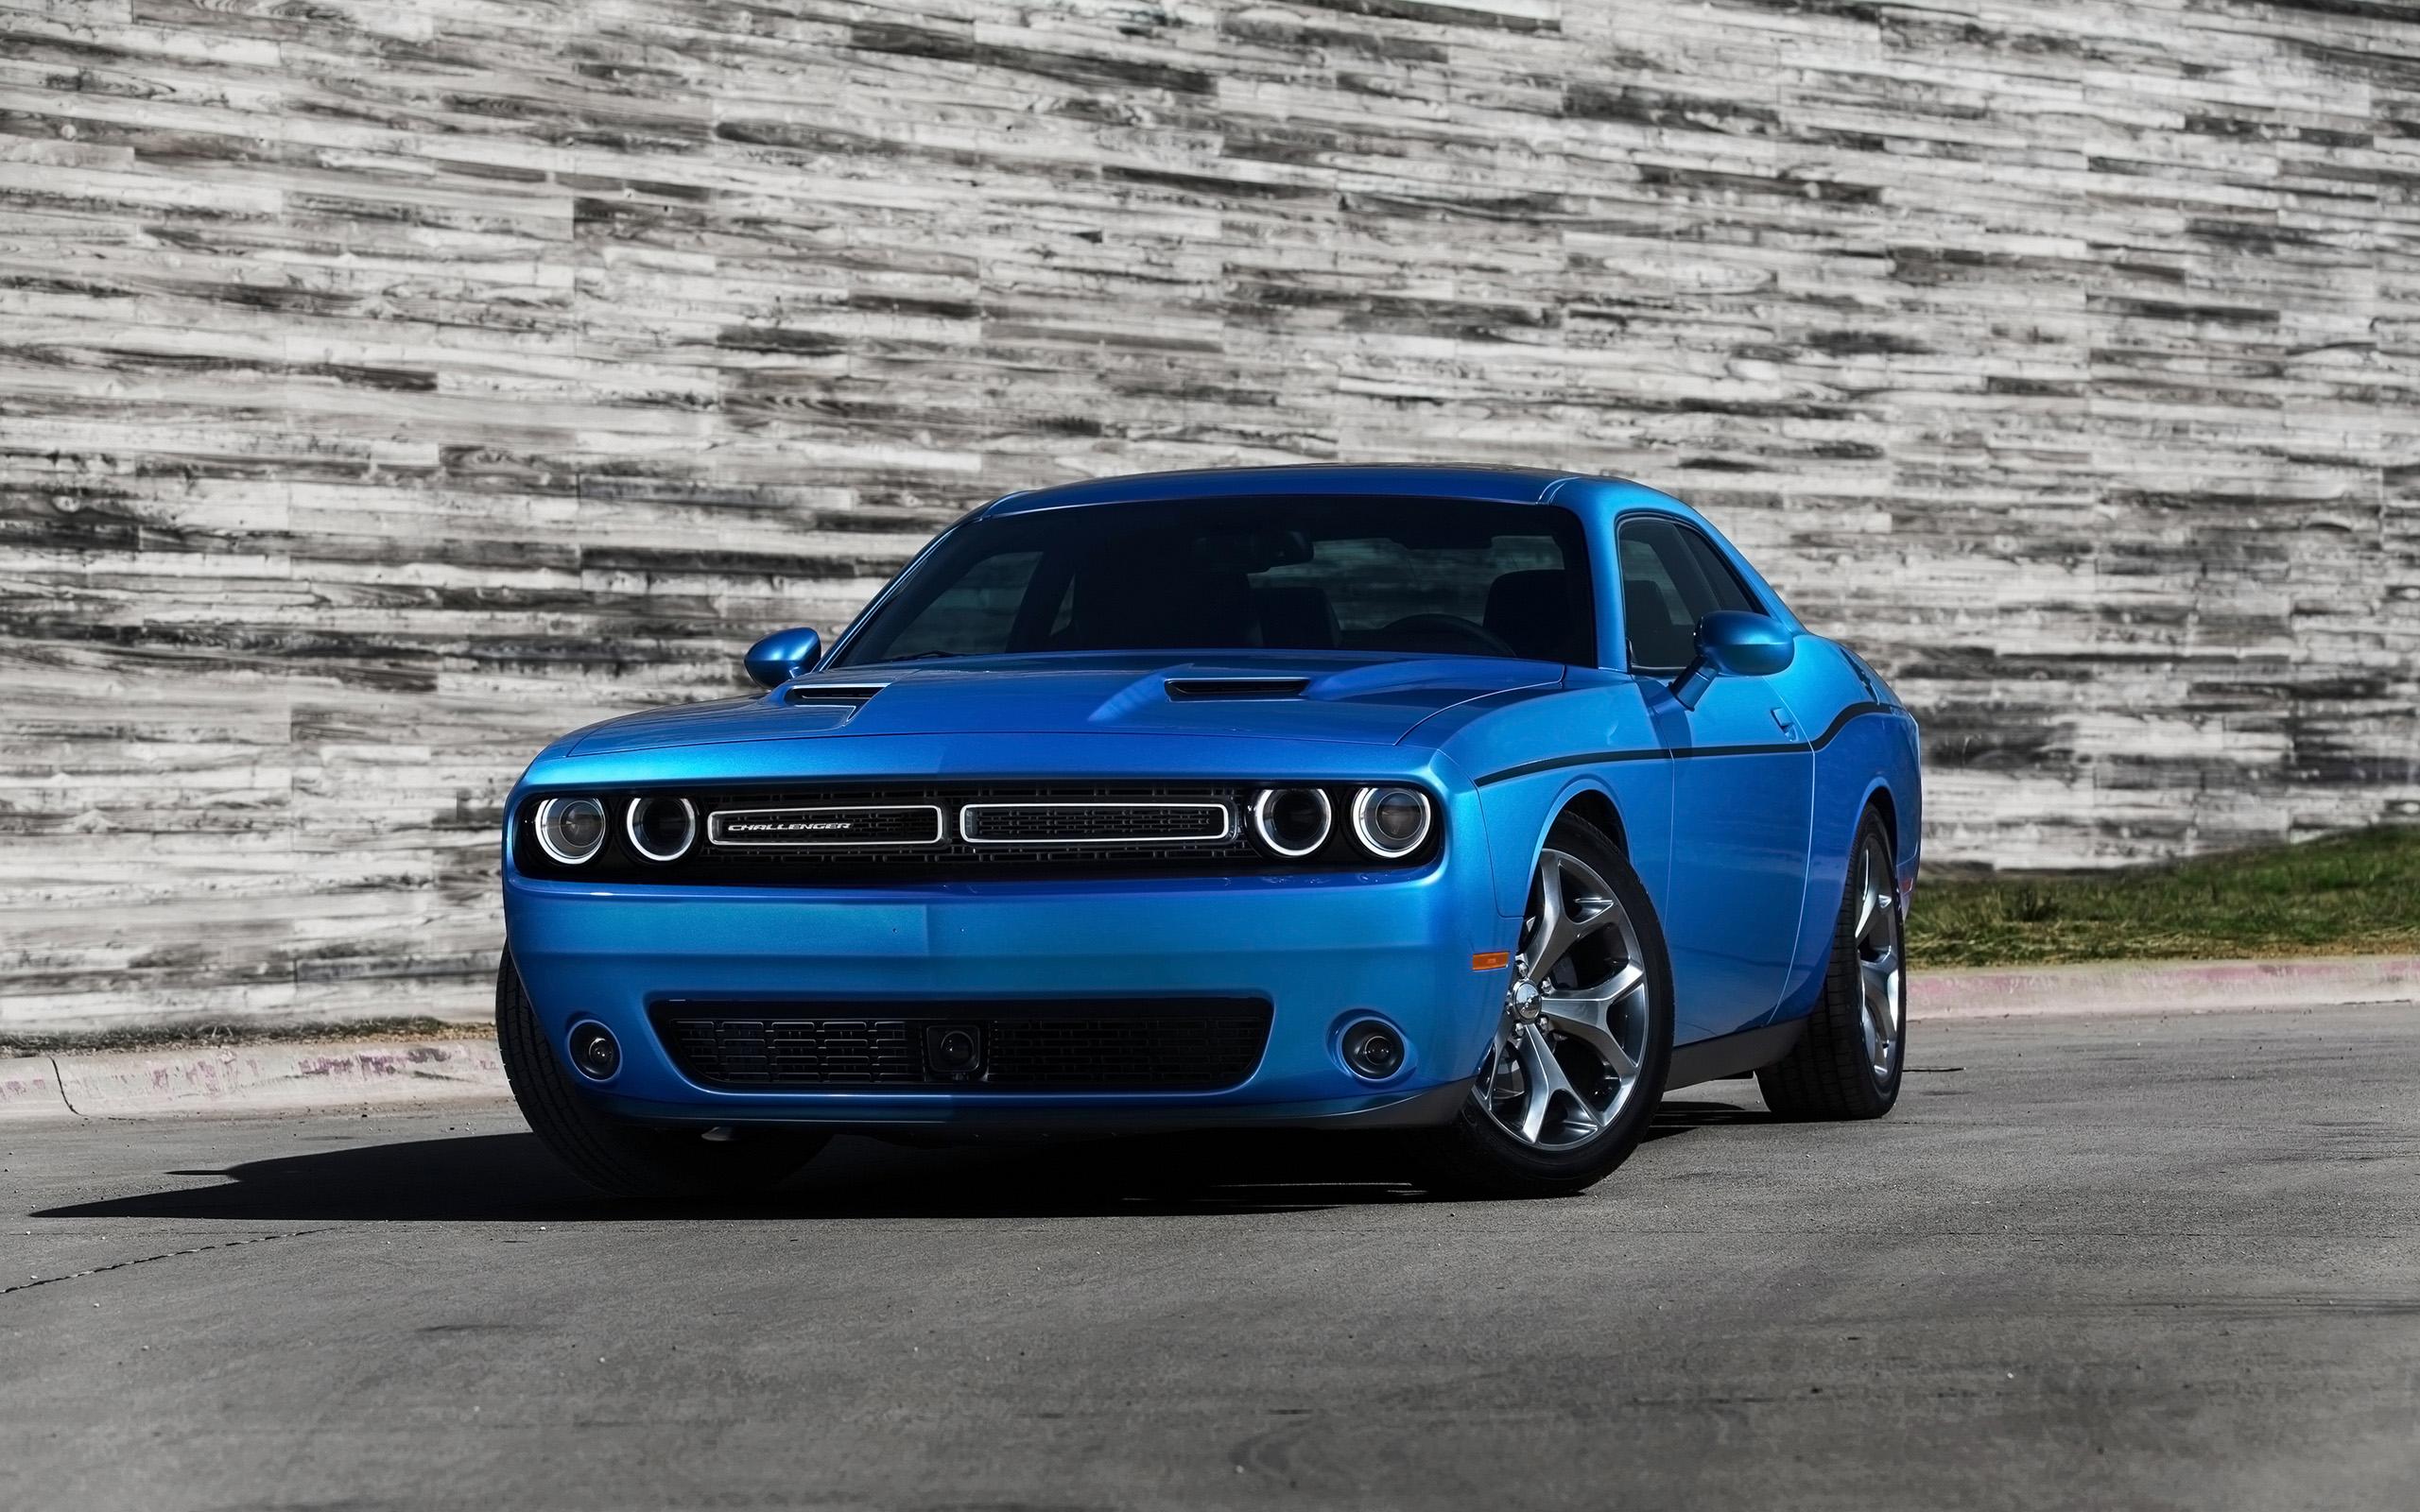 Top Dodge Challenger Hd Wallpaper Images for Pinterest 2560x1600